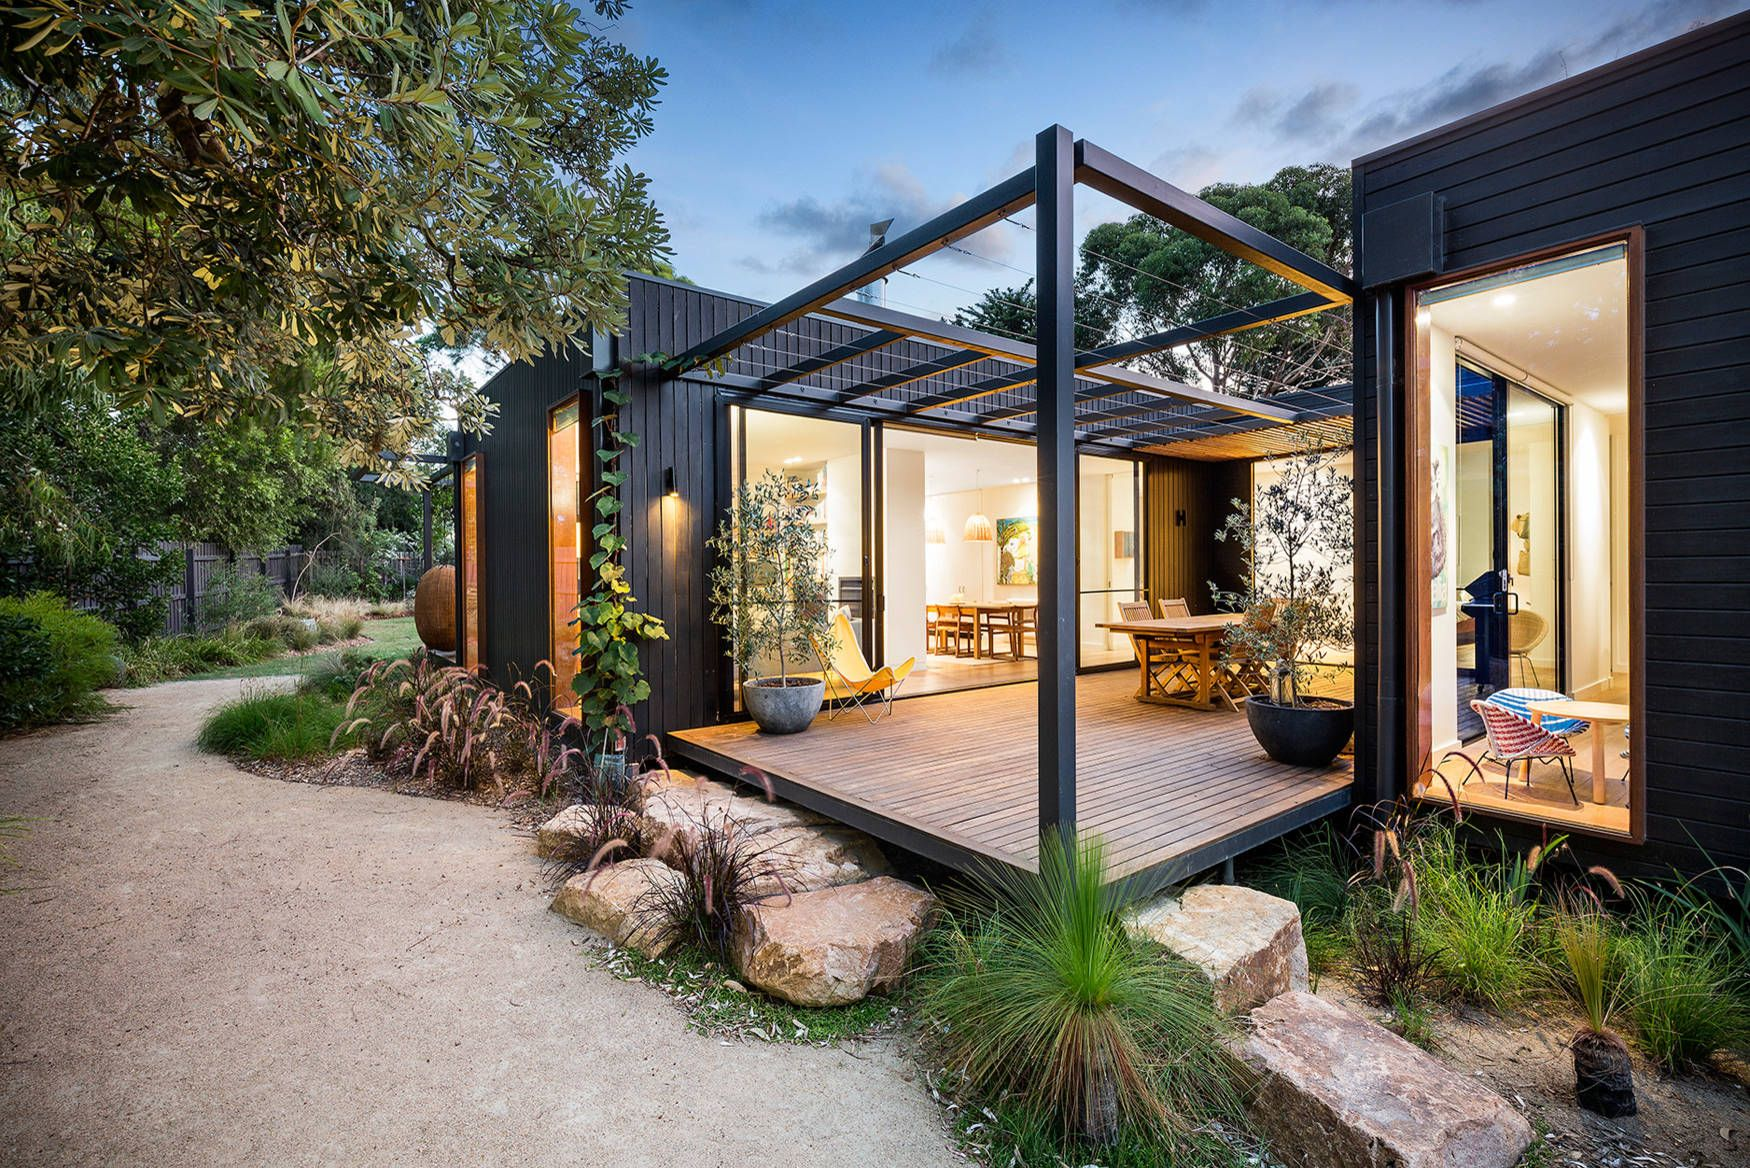 35 Wonderful Deck Designs #Home #Homedesign #Homedesignideas #Homedecorideas #Homedecor #